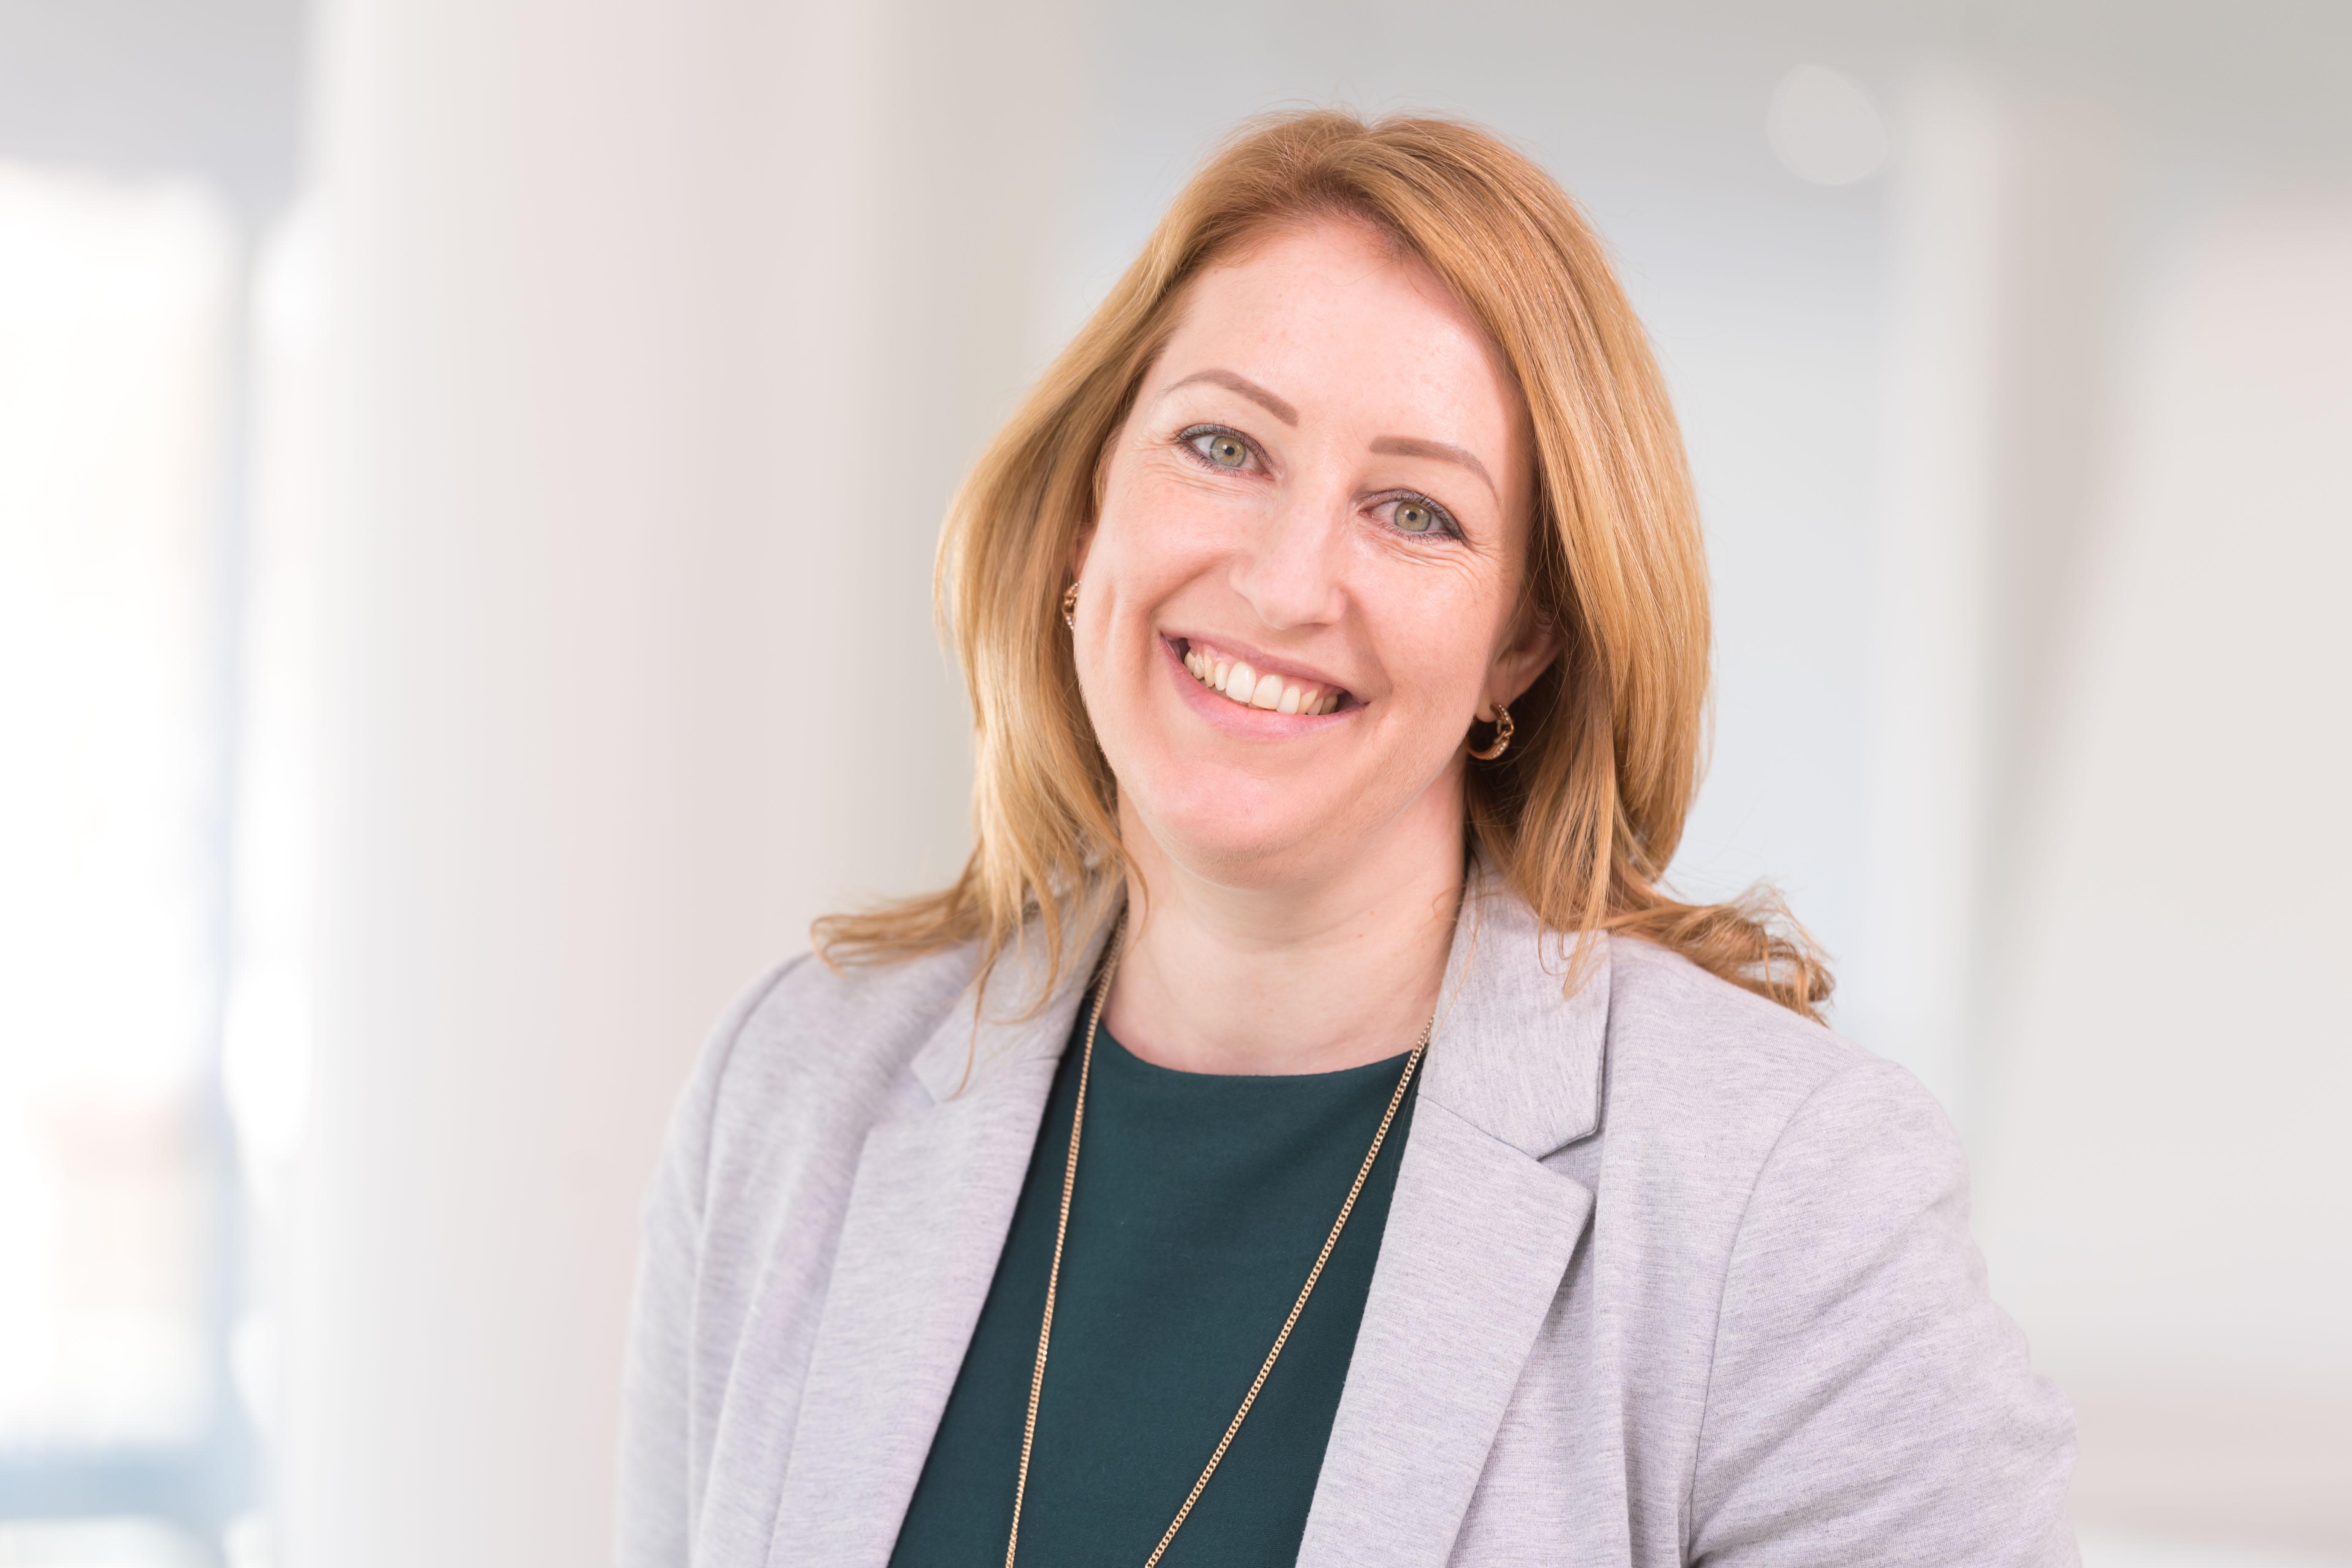 Katharina Krentz, expert on digital collaboration